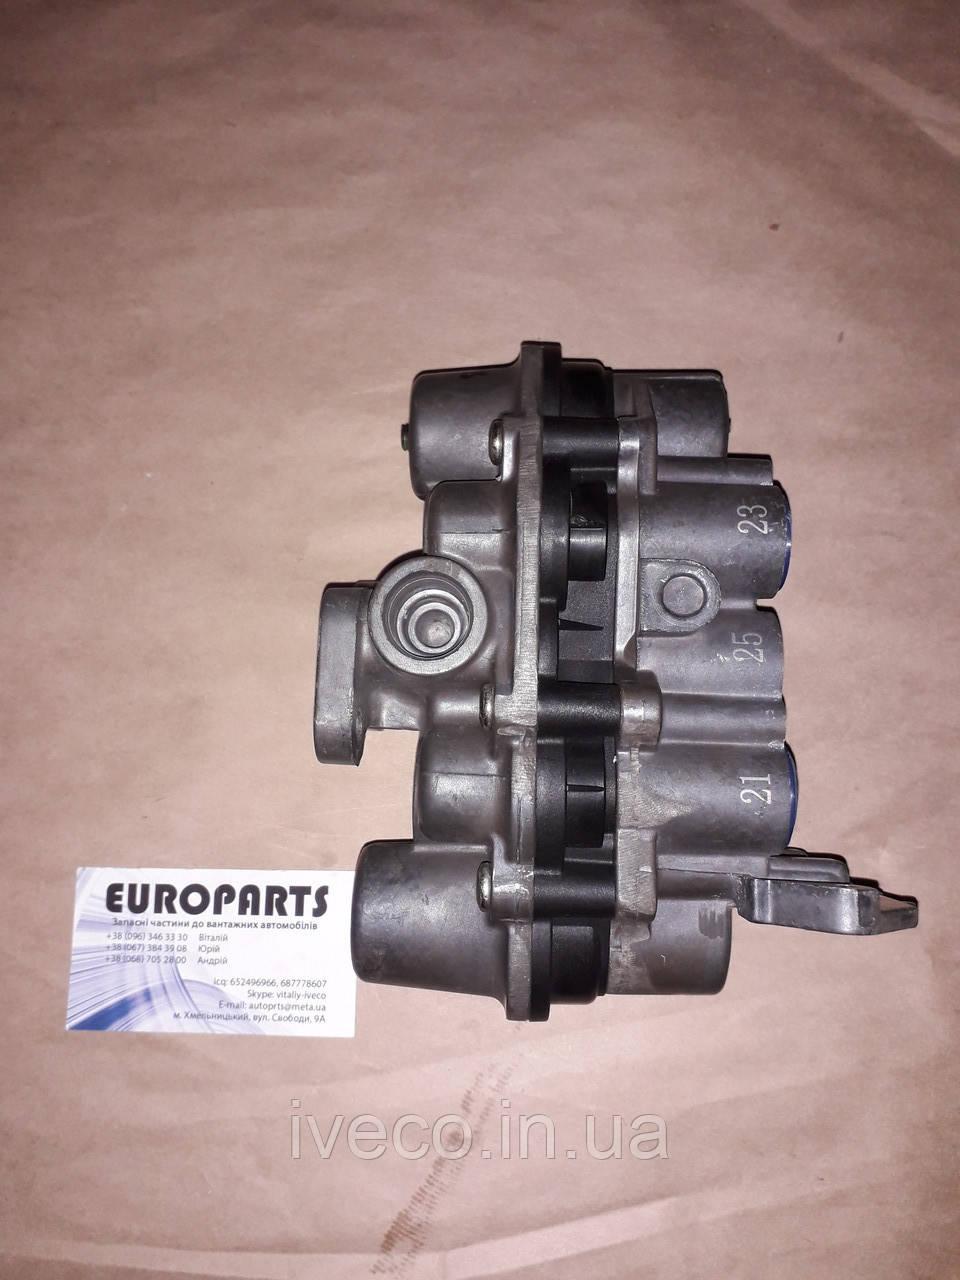 42553849 42535024 AE4502 AE4560 Кран защитный четырехконтурный Iveco Ивеко Cursor Eurotech Eurostar Trakker